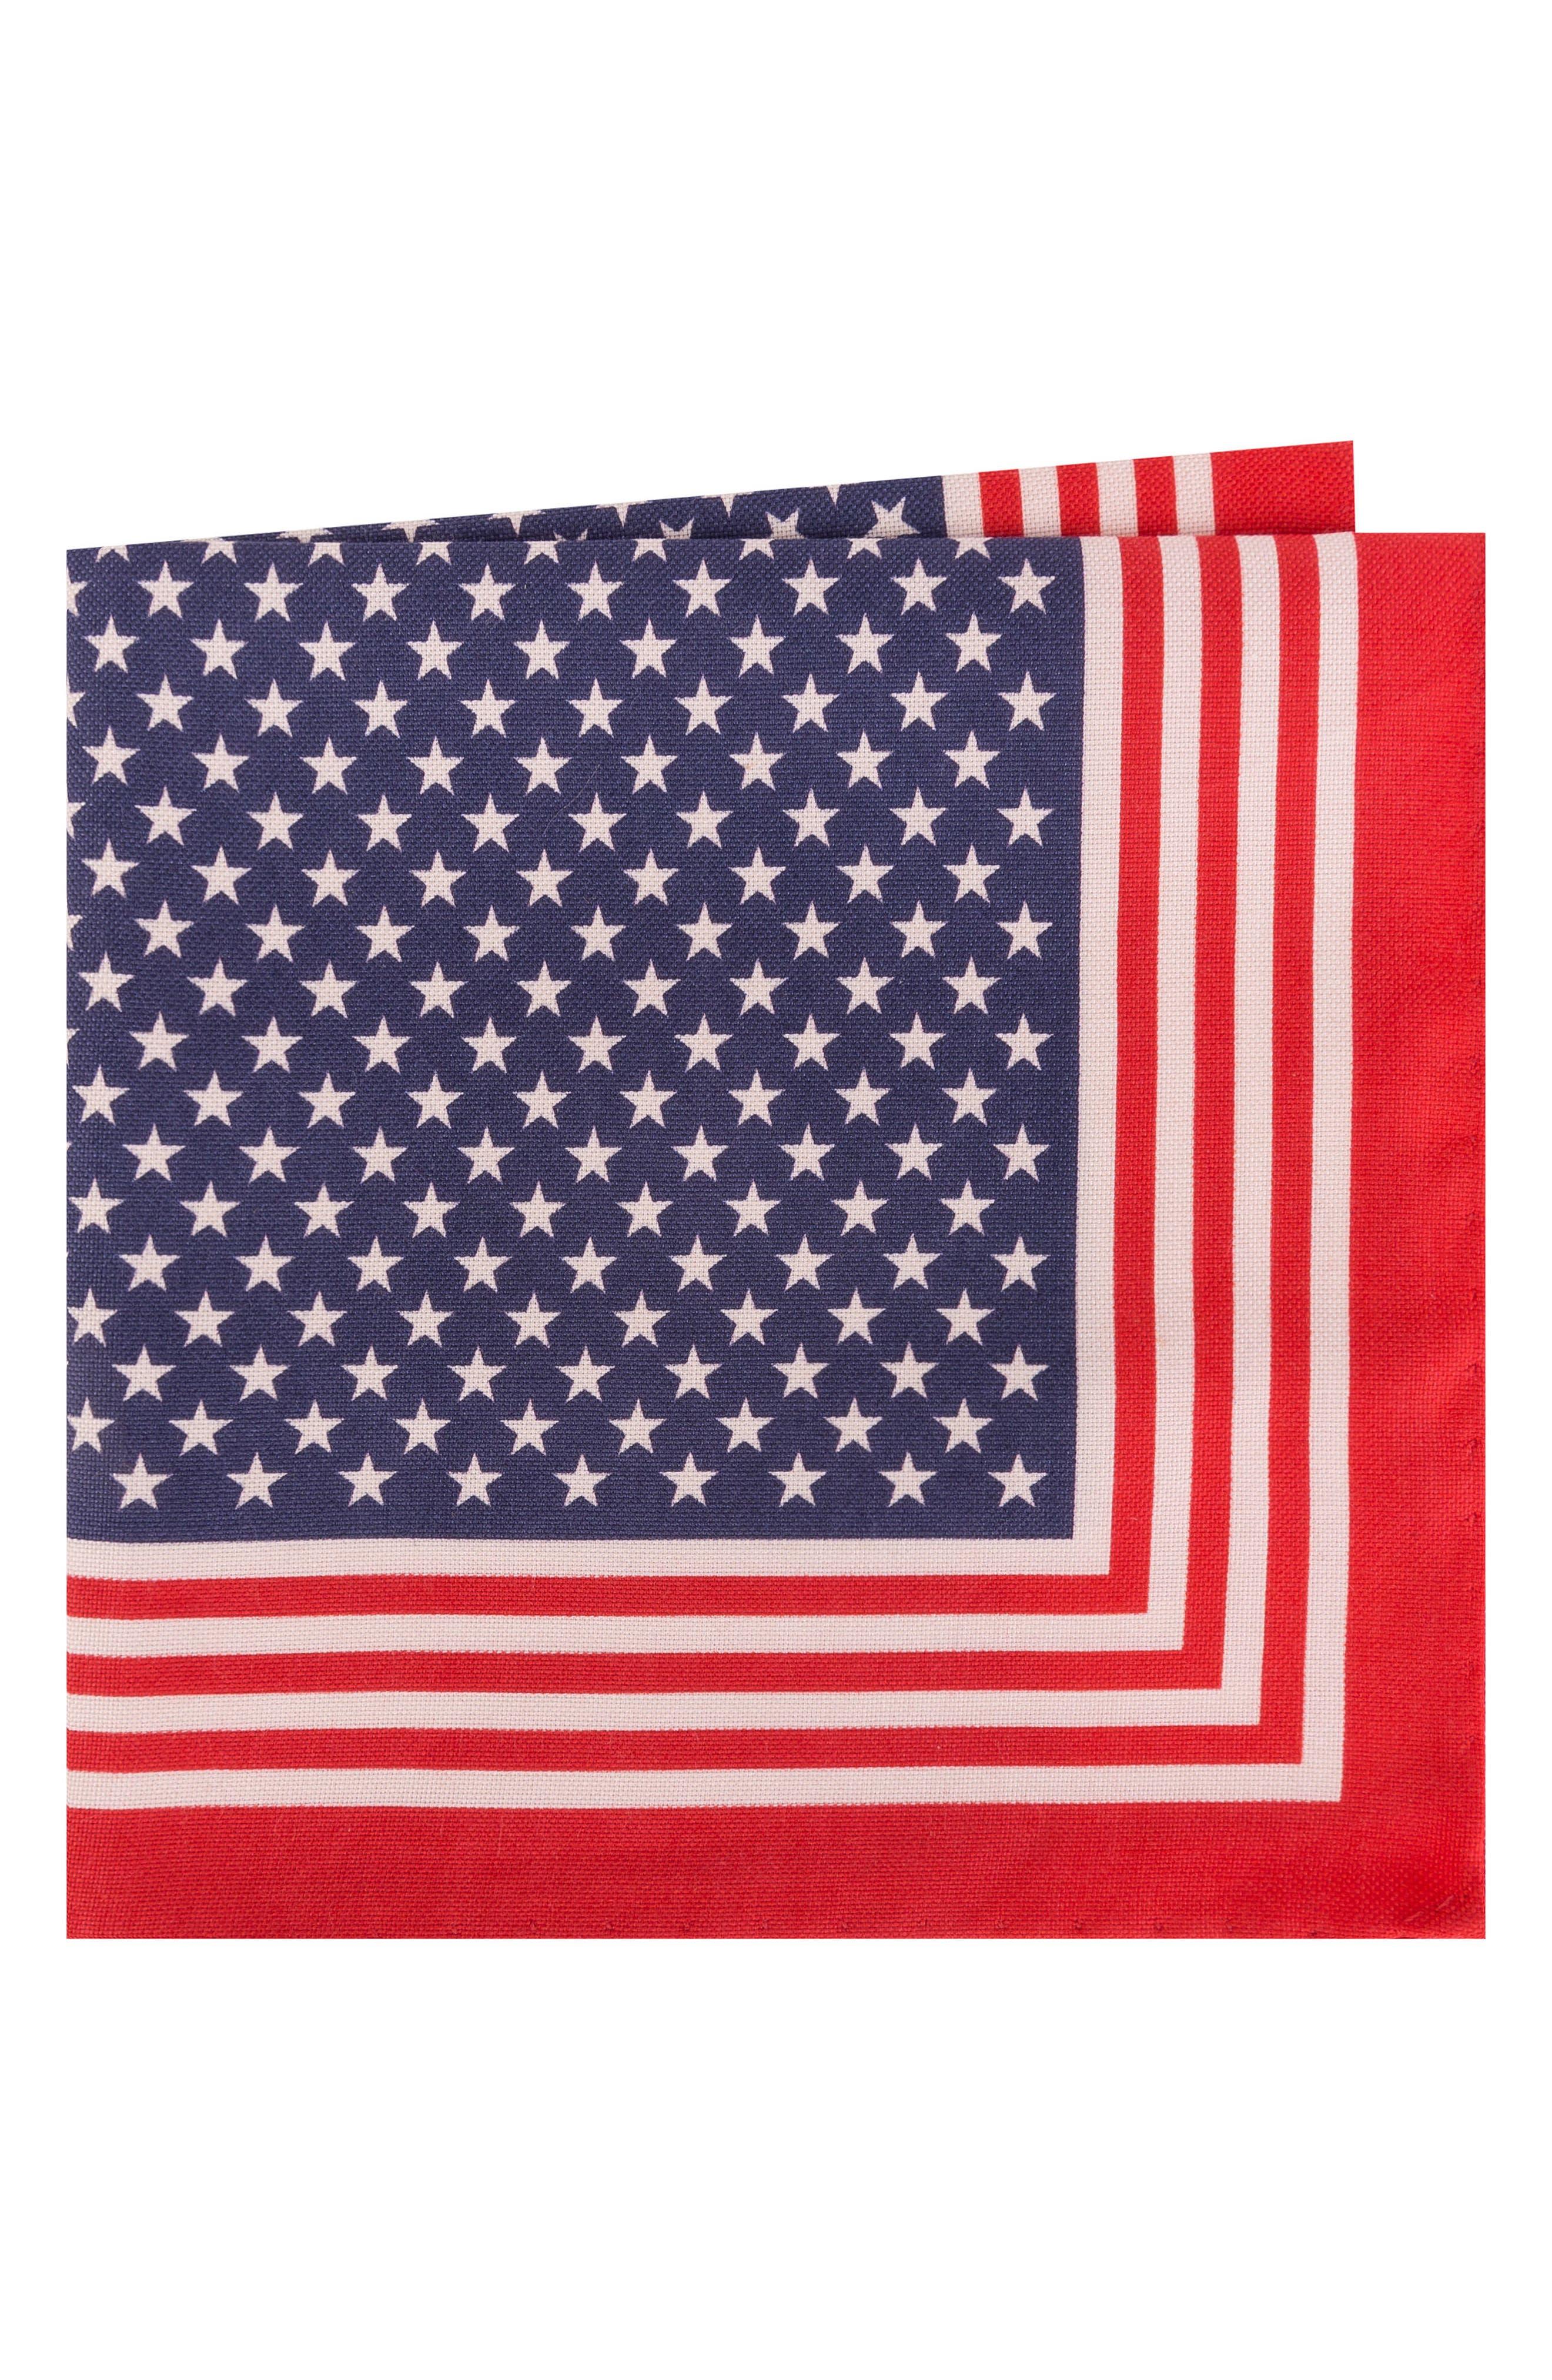 Stars & Stripes Cotton & Silk Pocket Square,                             Main thumbnail 1, color,                             Red/ Blue